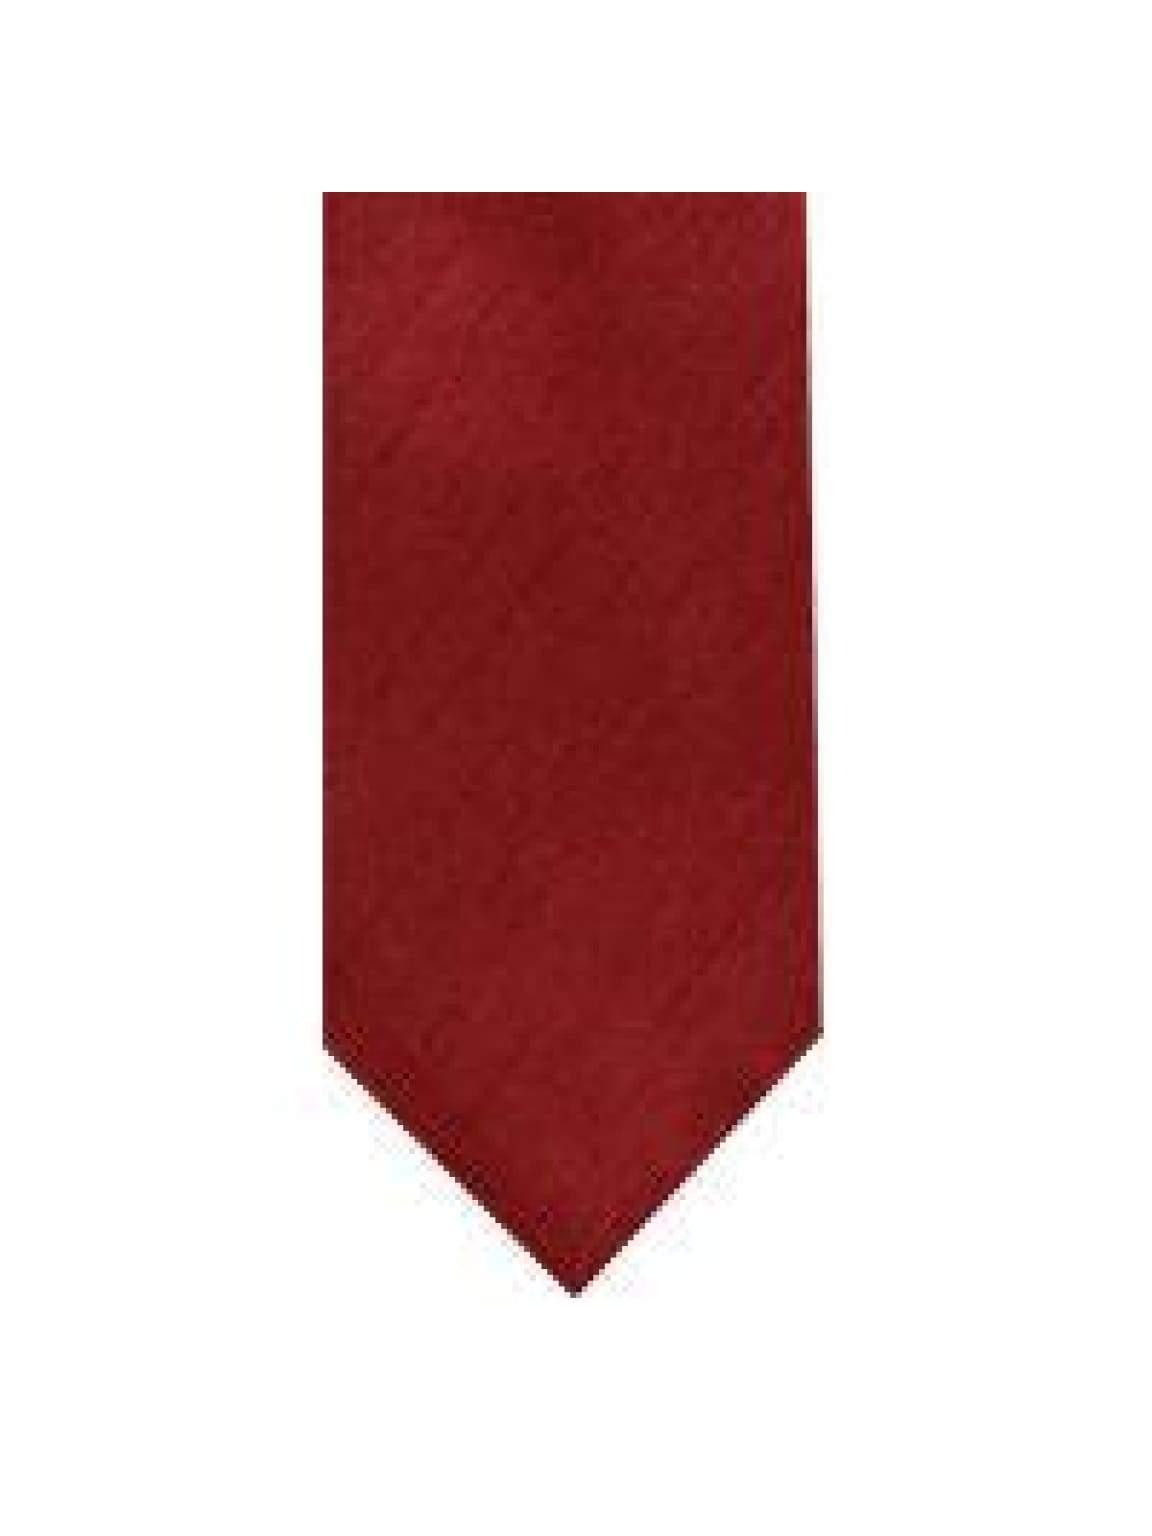 LA Smith Red Skinny Shantung Tie - Accessories